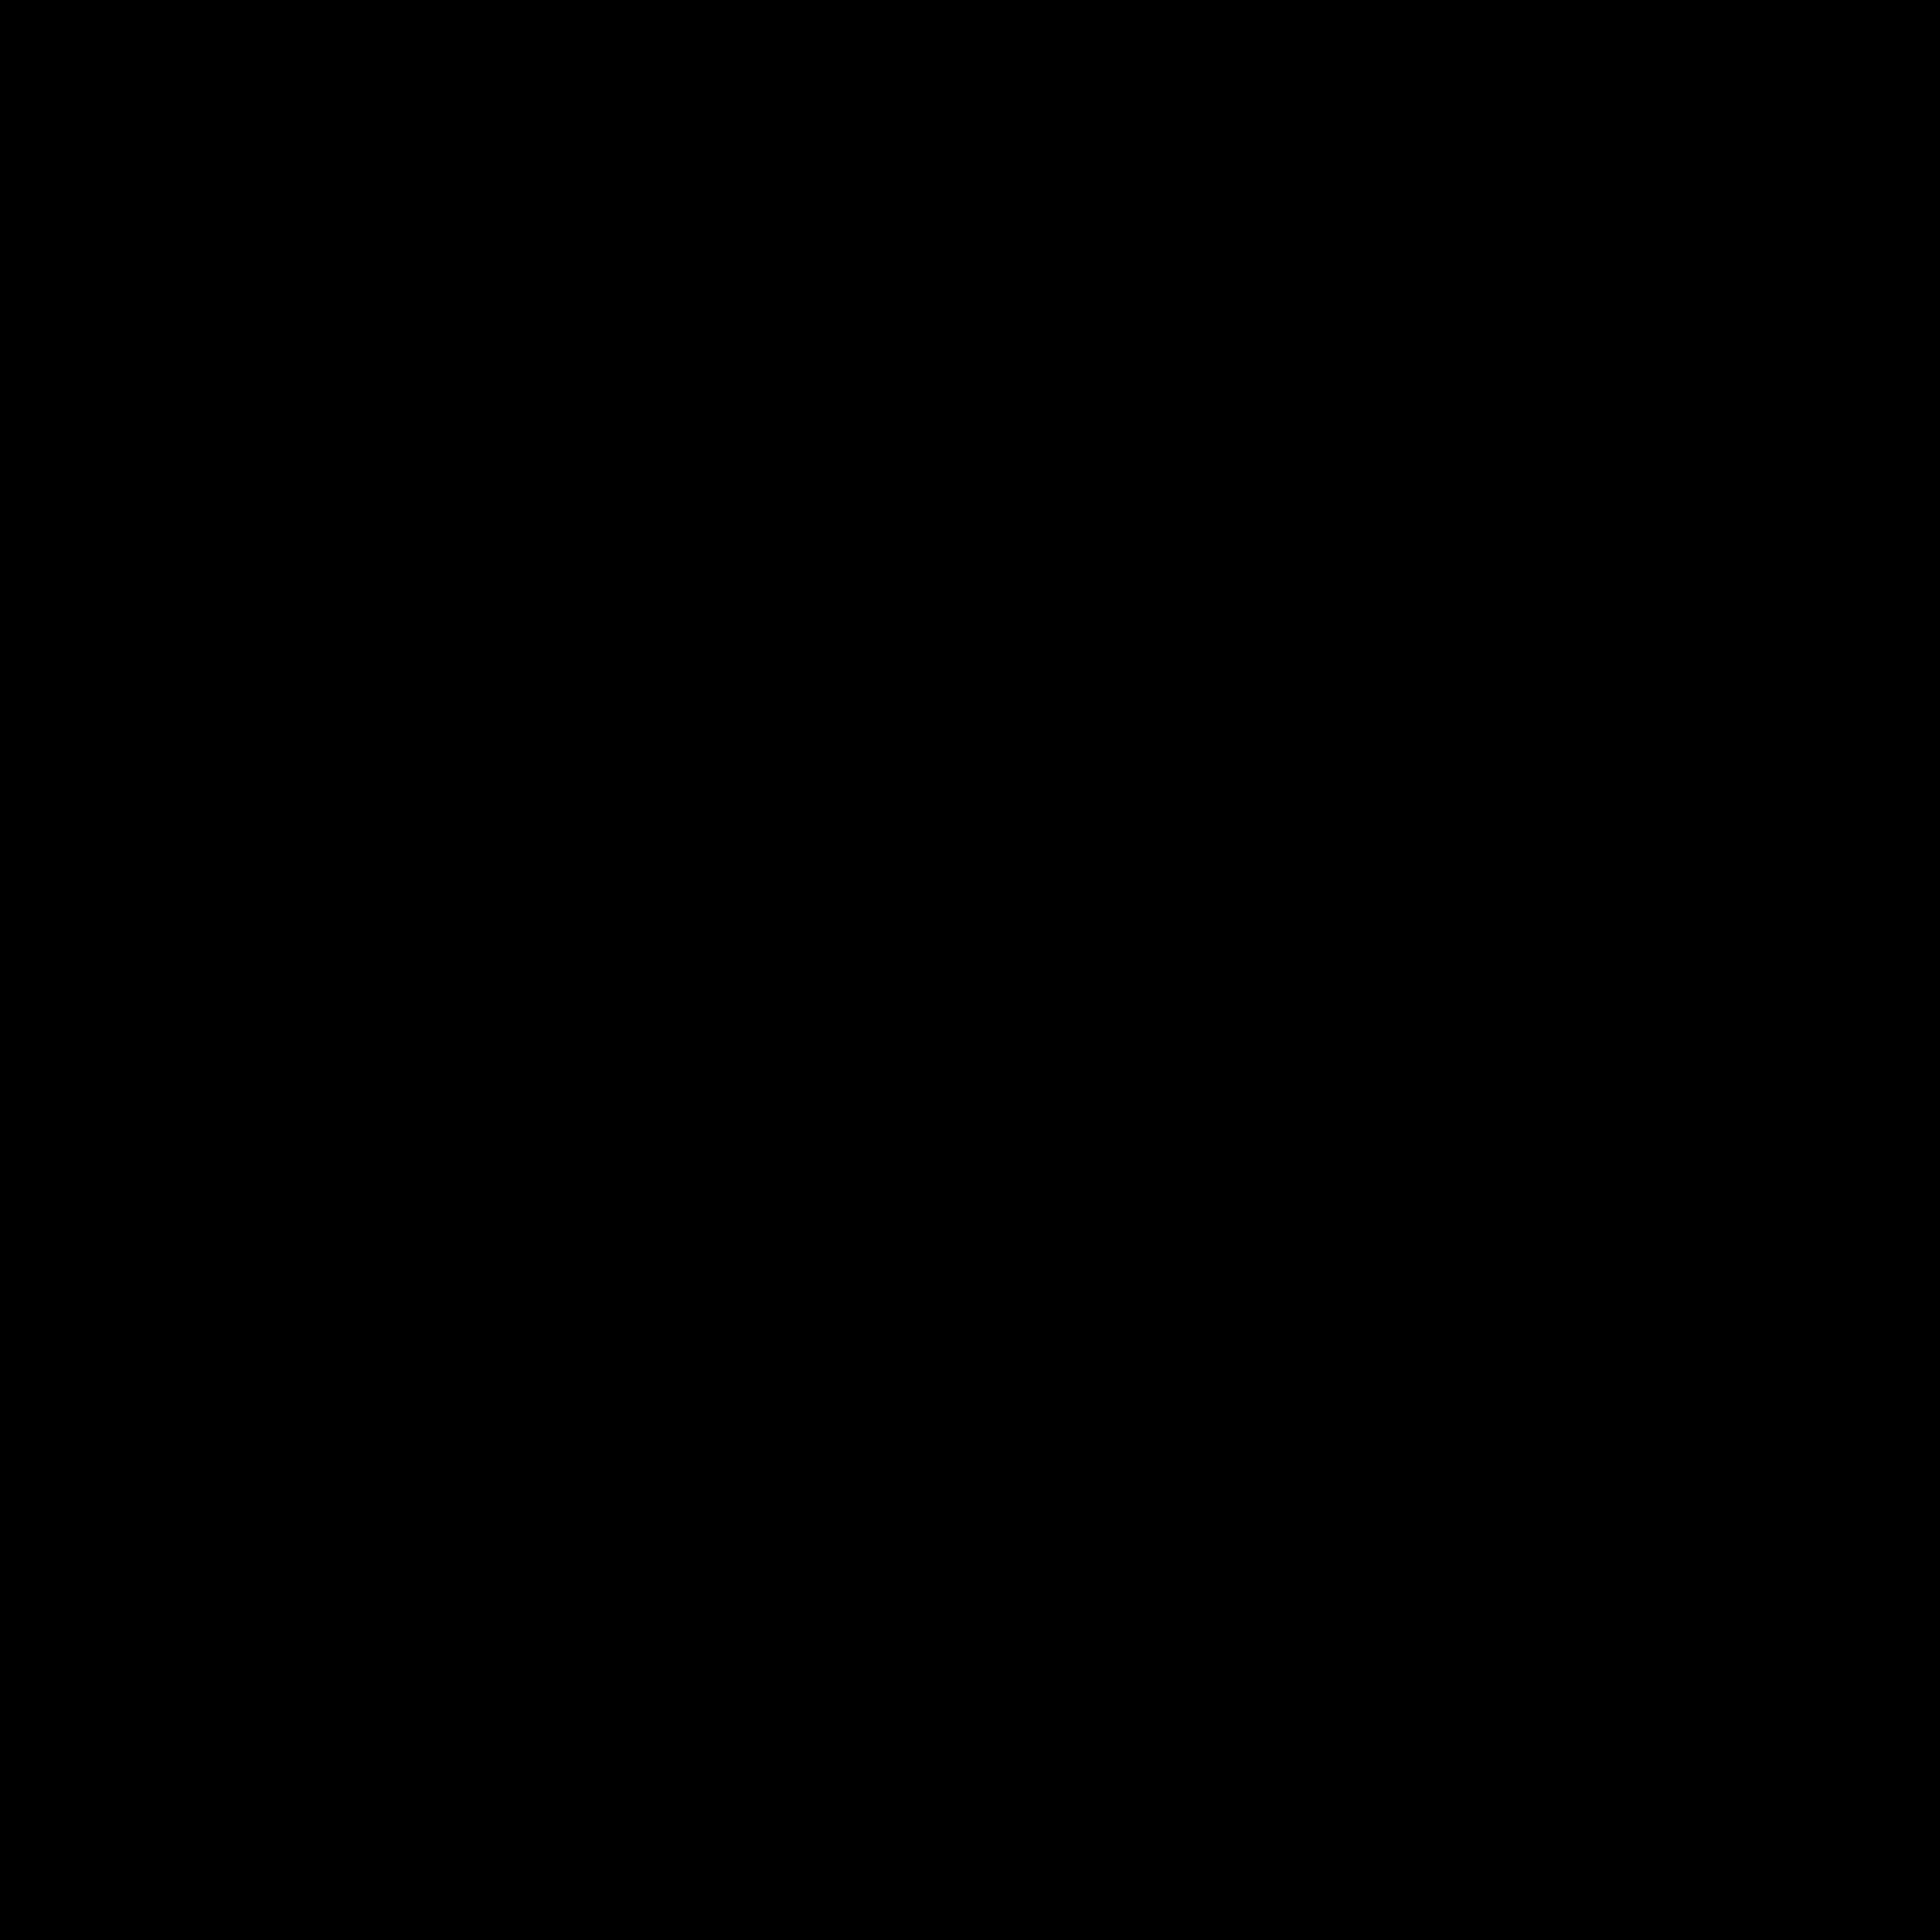 Risultati immagini per la prairie logo transparent